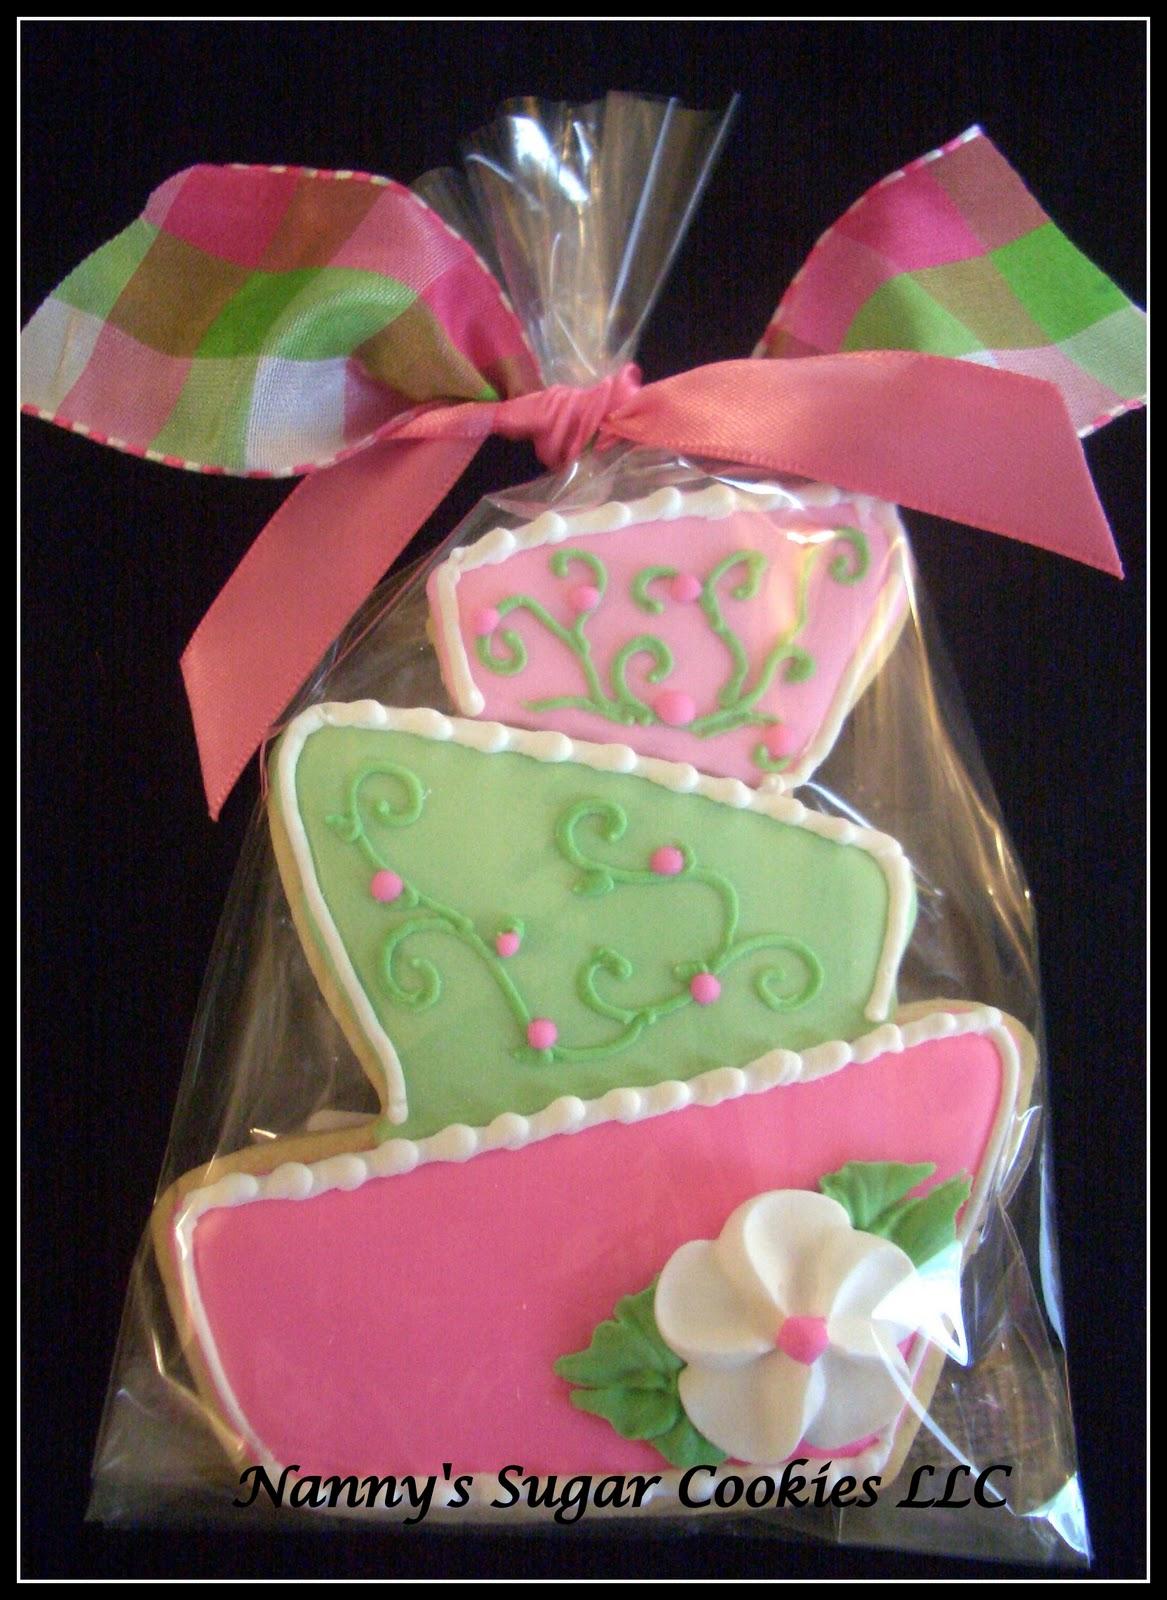 Nanny\'s Sugar Cookies LLC: February 2011